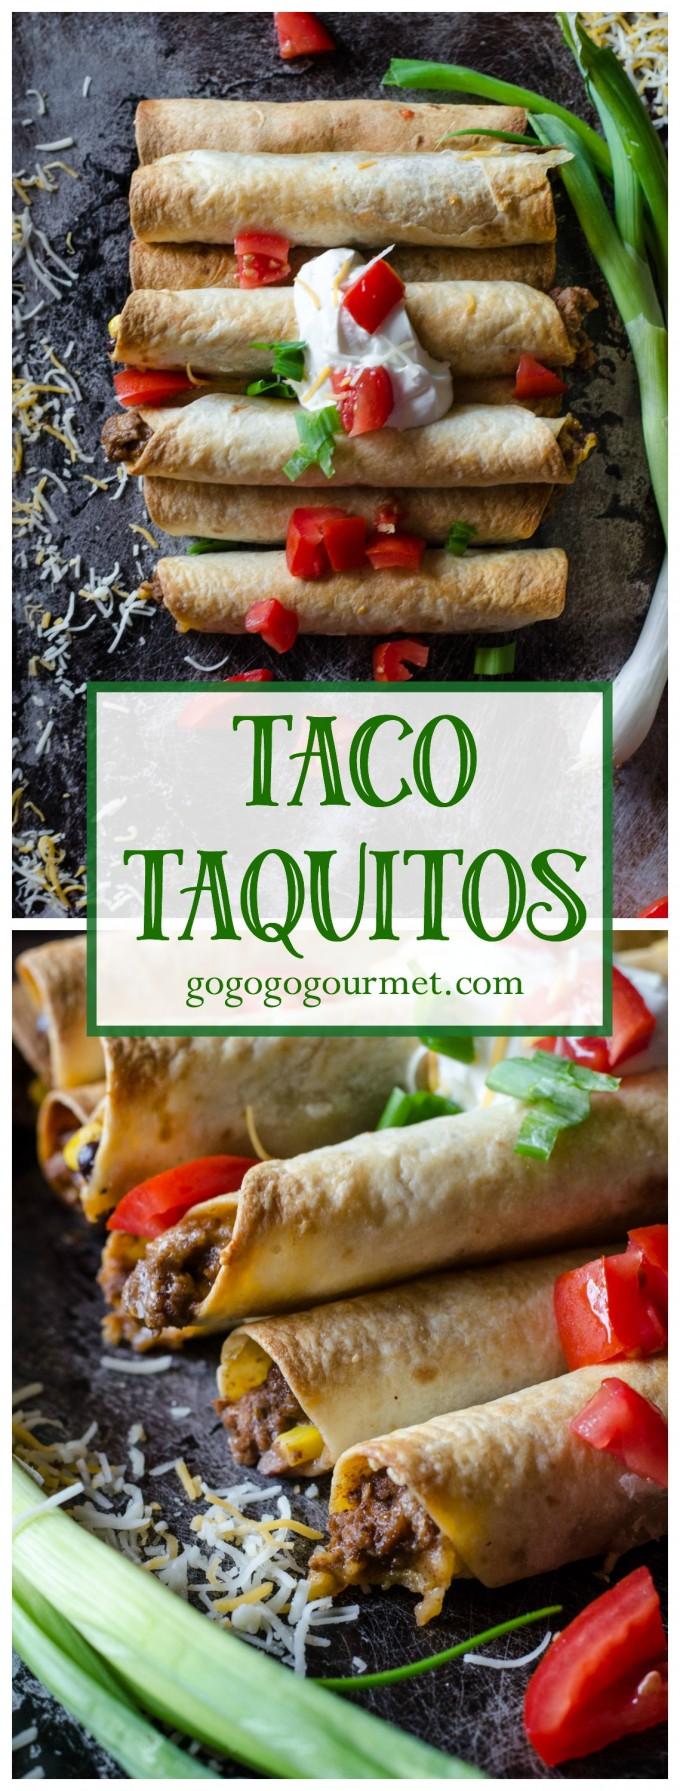 Easy Taco Taquitos- weeknight dinner at its finest! @gogogogourmet